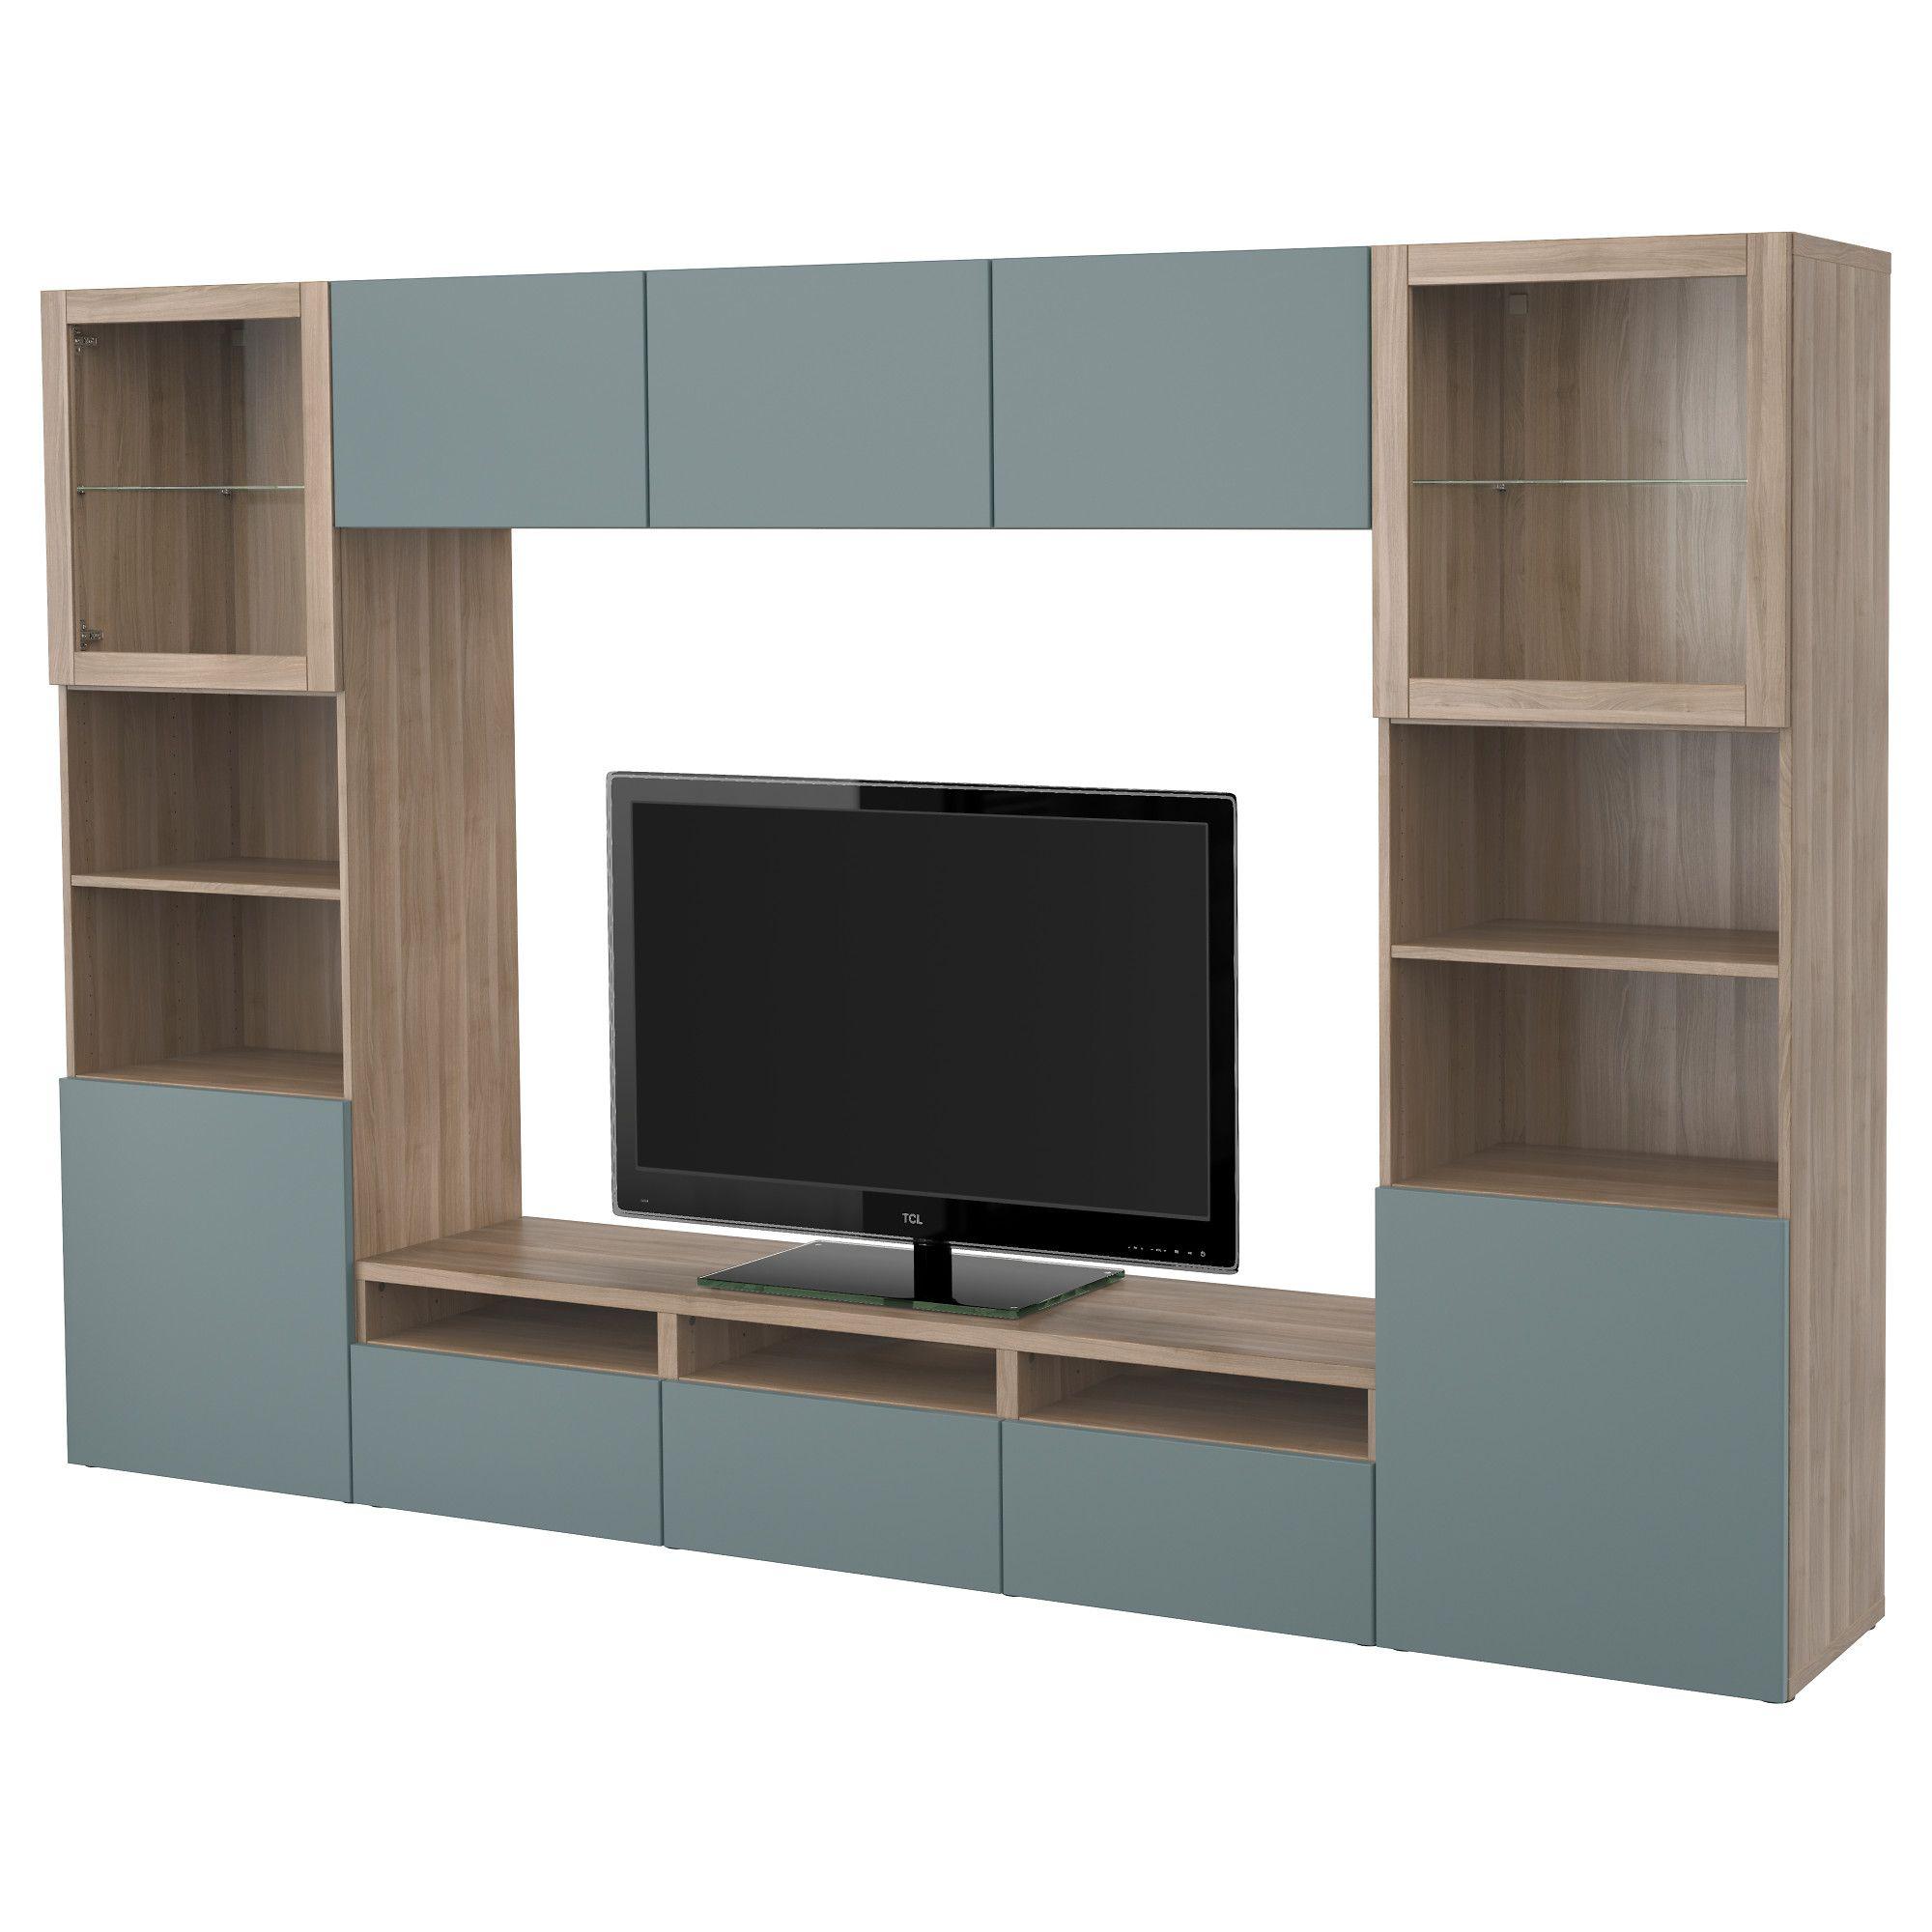 Ikea Best Tv Storage Combinationglass Doors Walnut Effect Light